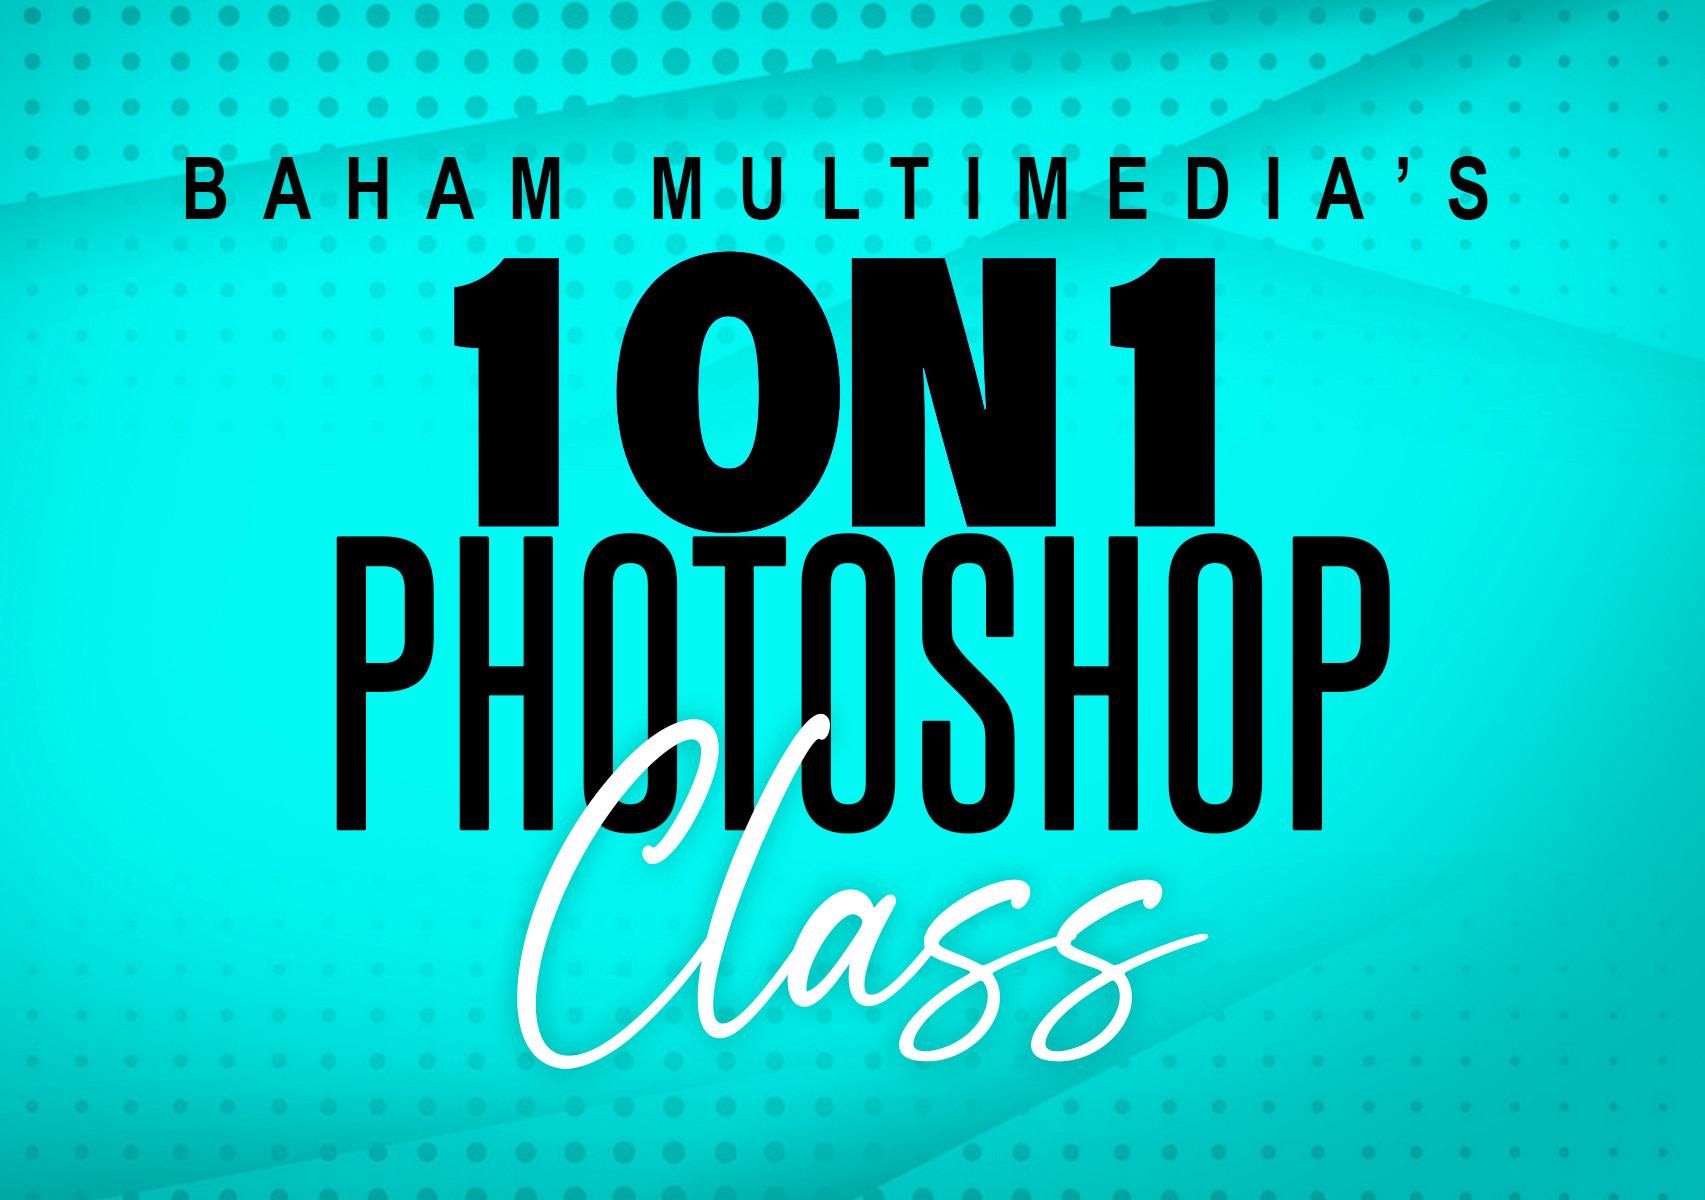 1 on 1 Photoshop Class (60 MINS)